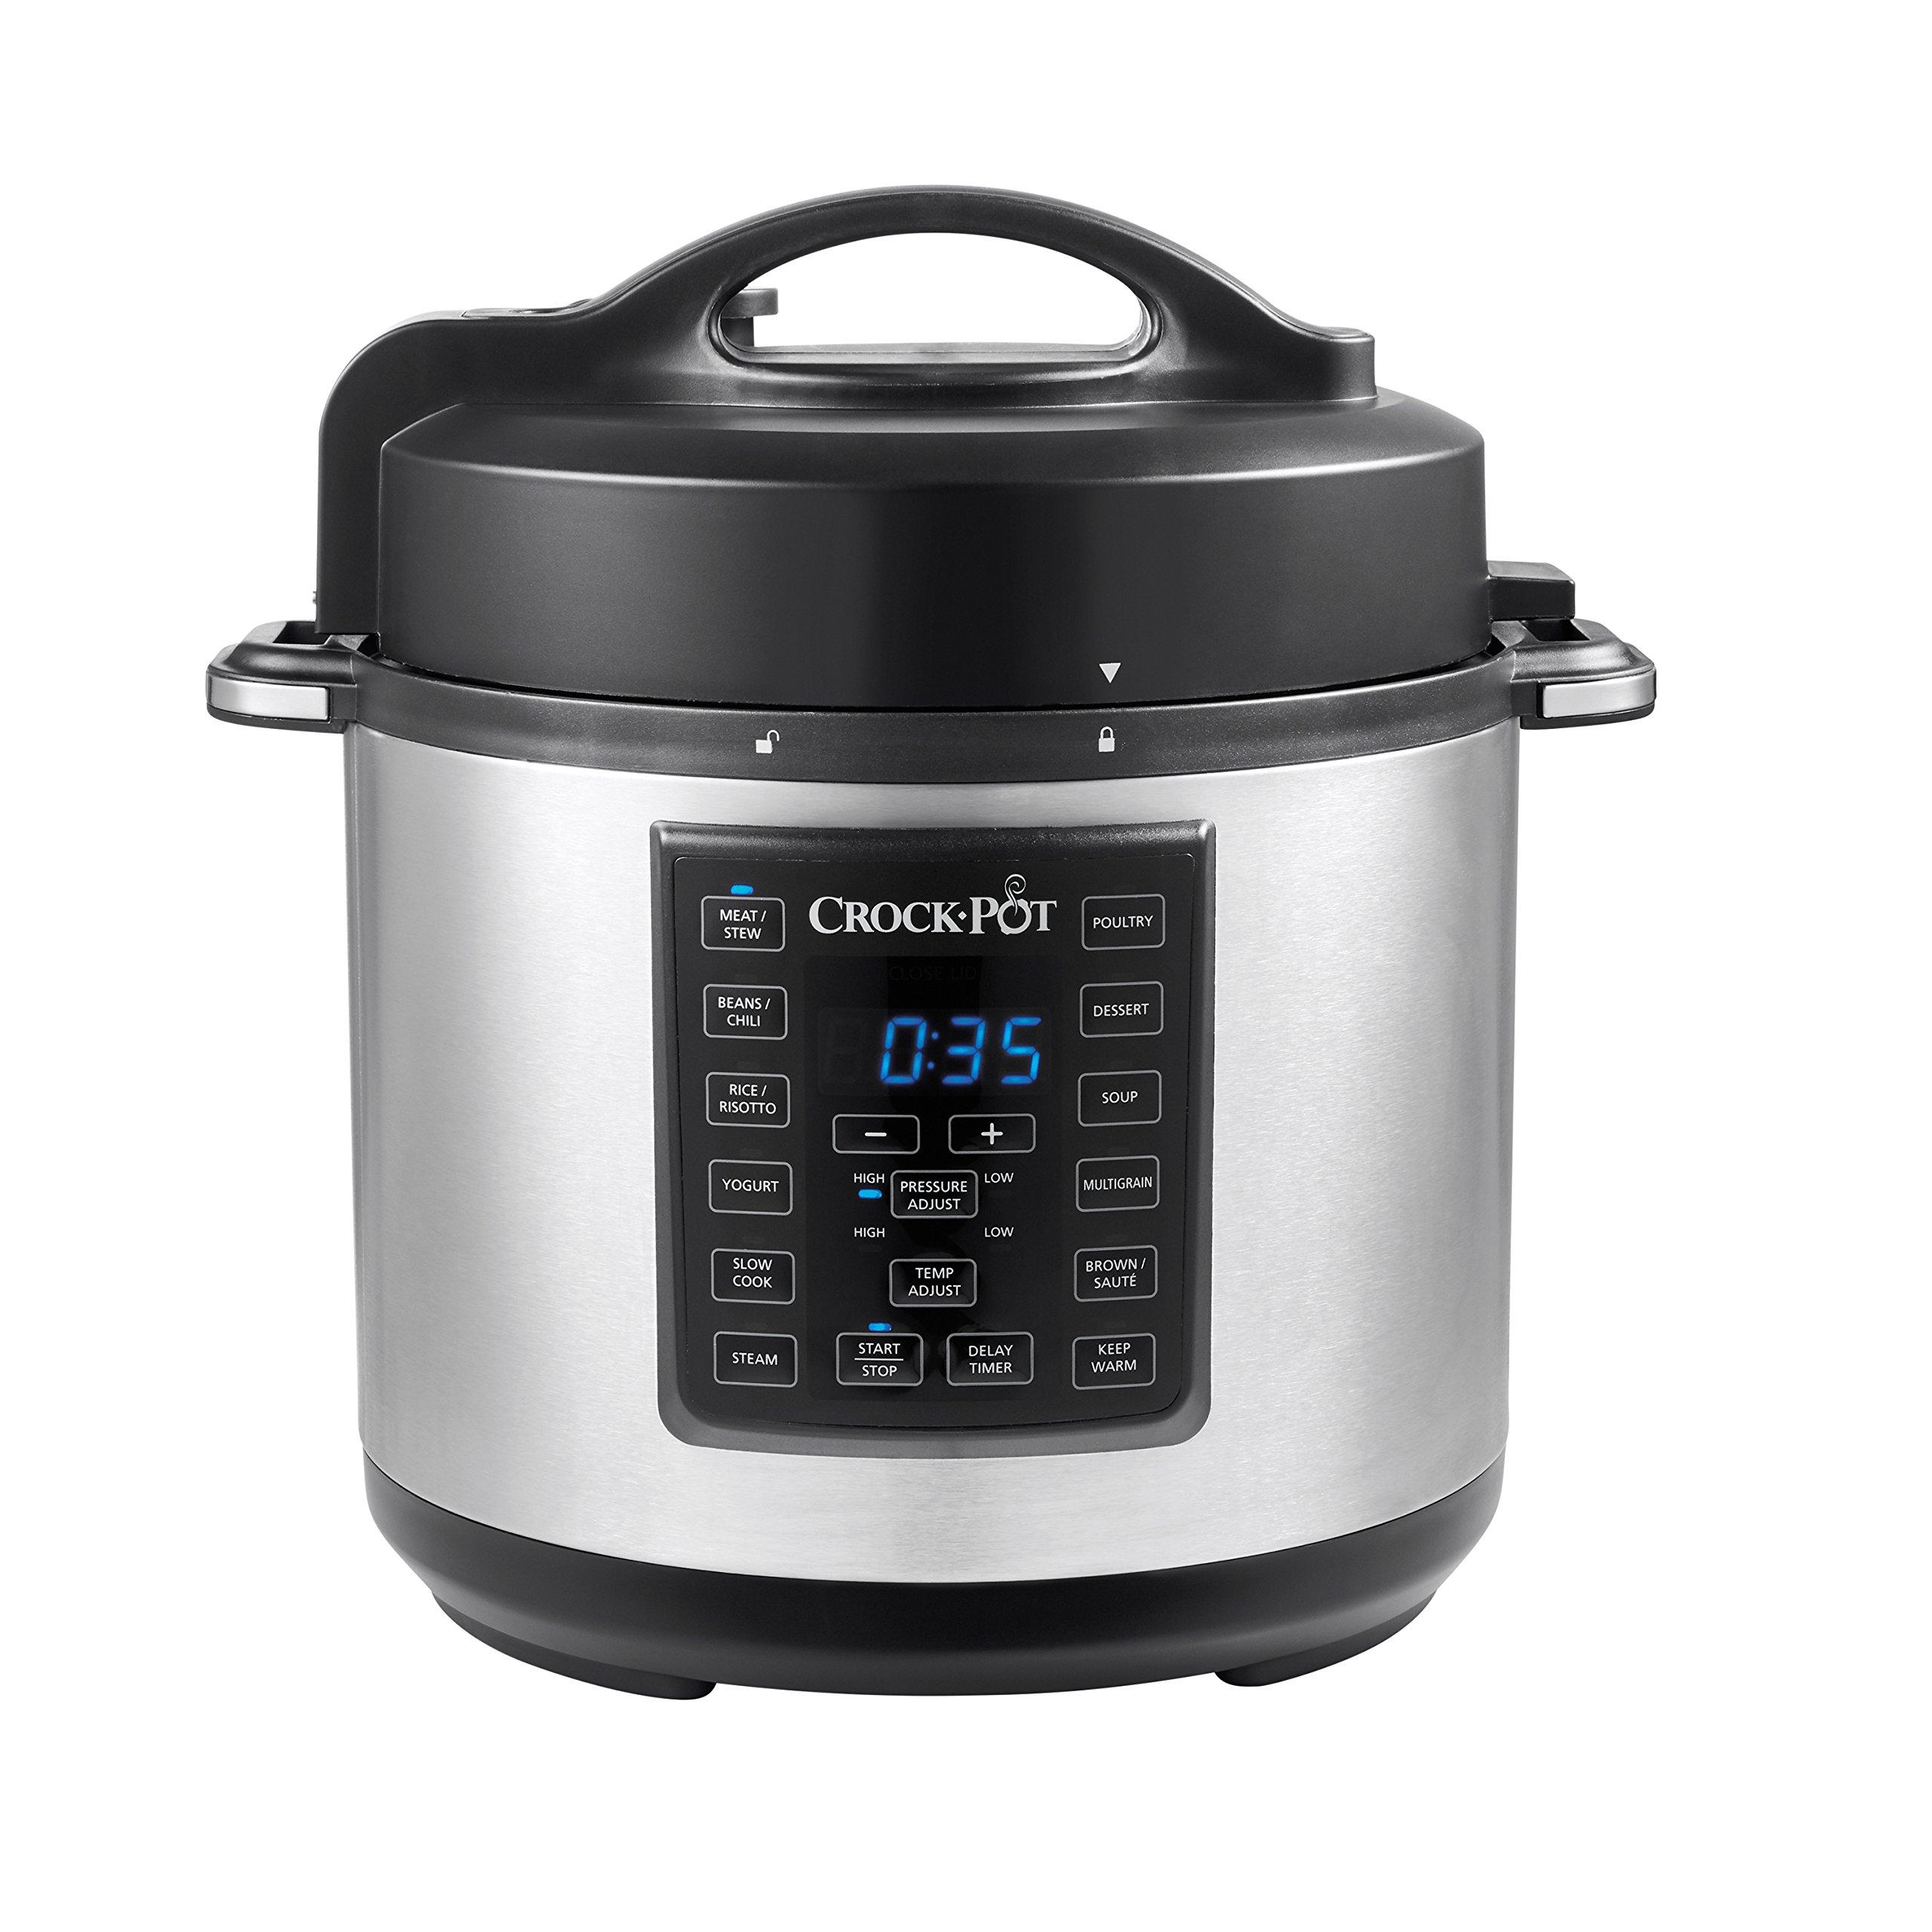 Crock Pot 6 Quart 8 in 1 Multi Use Express Crock Programmable Pressure Cooker, Slow Cooker, Sauté & Steamer   Stainless Steel (SCCPPC600 V1) by Crockpot